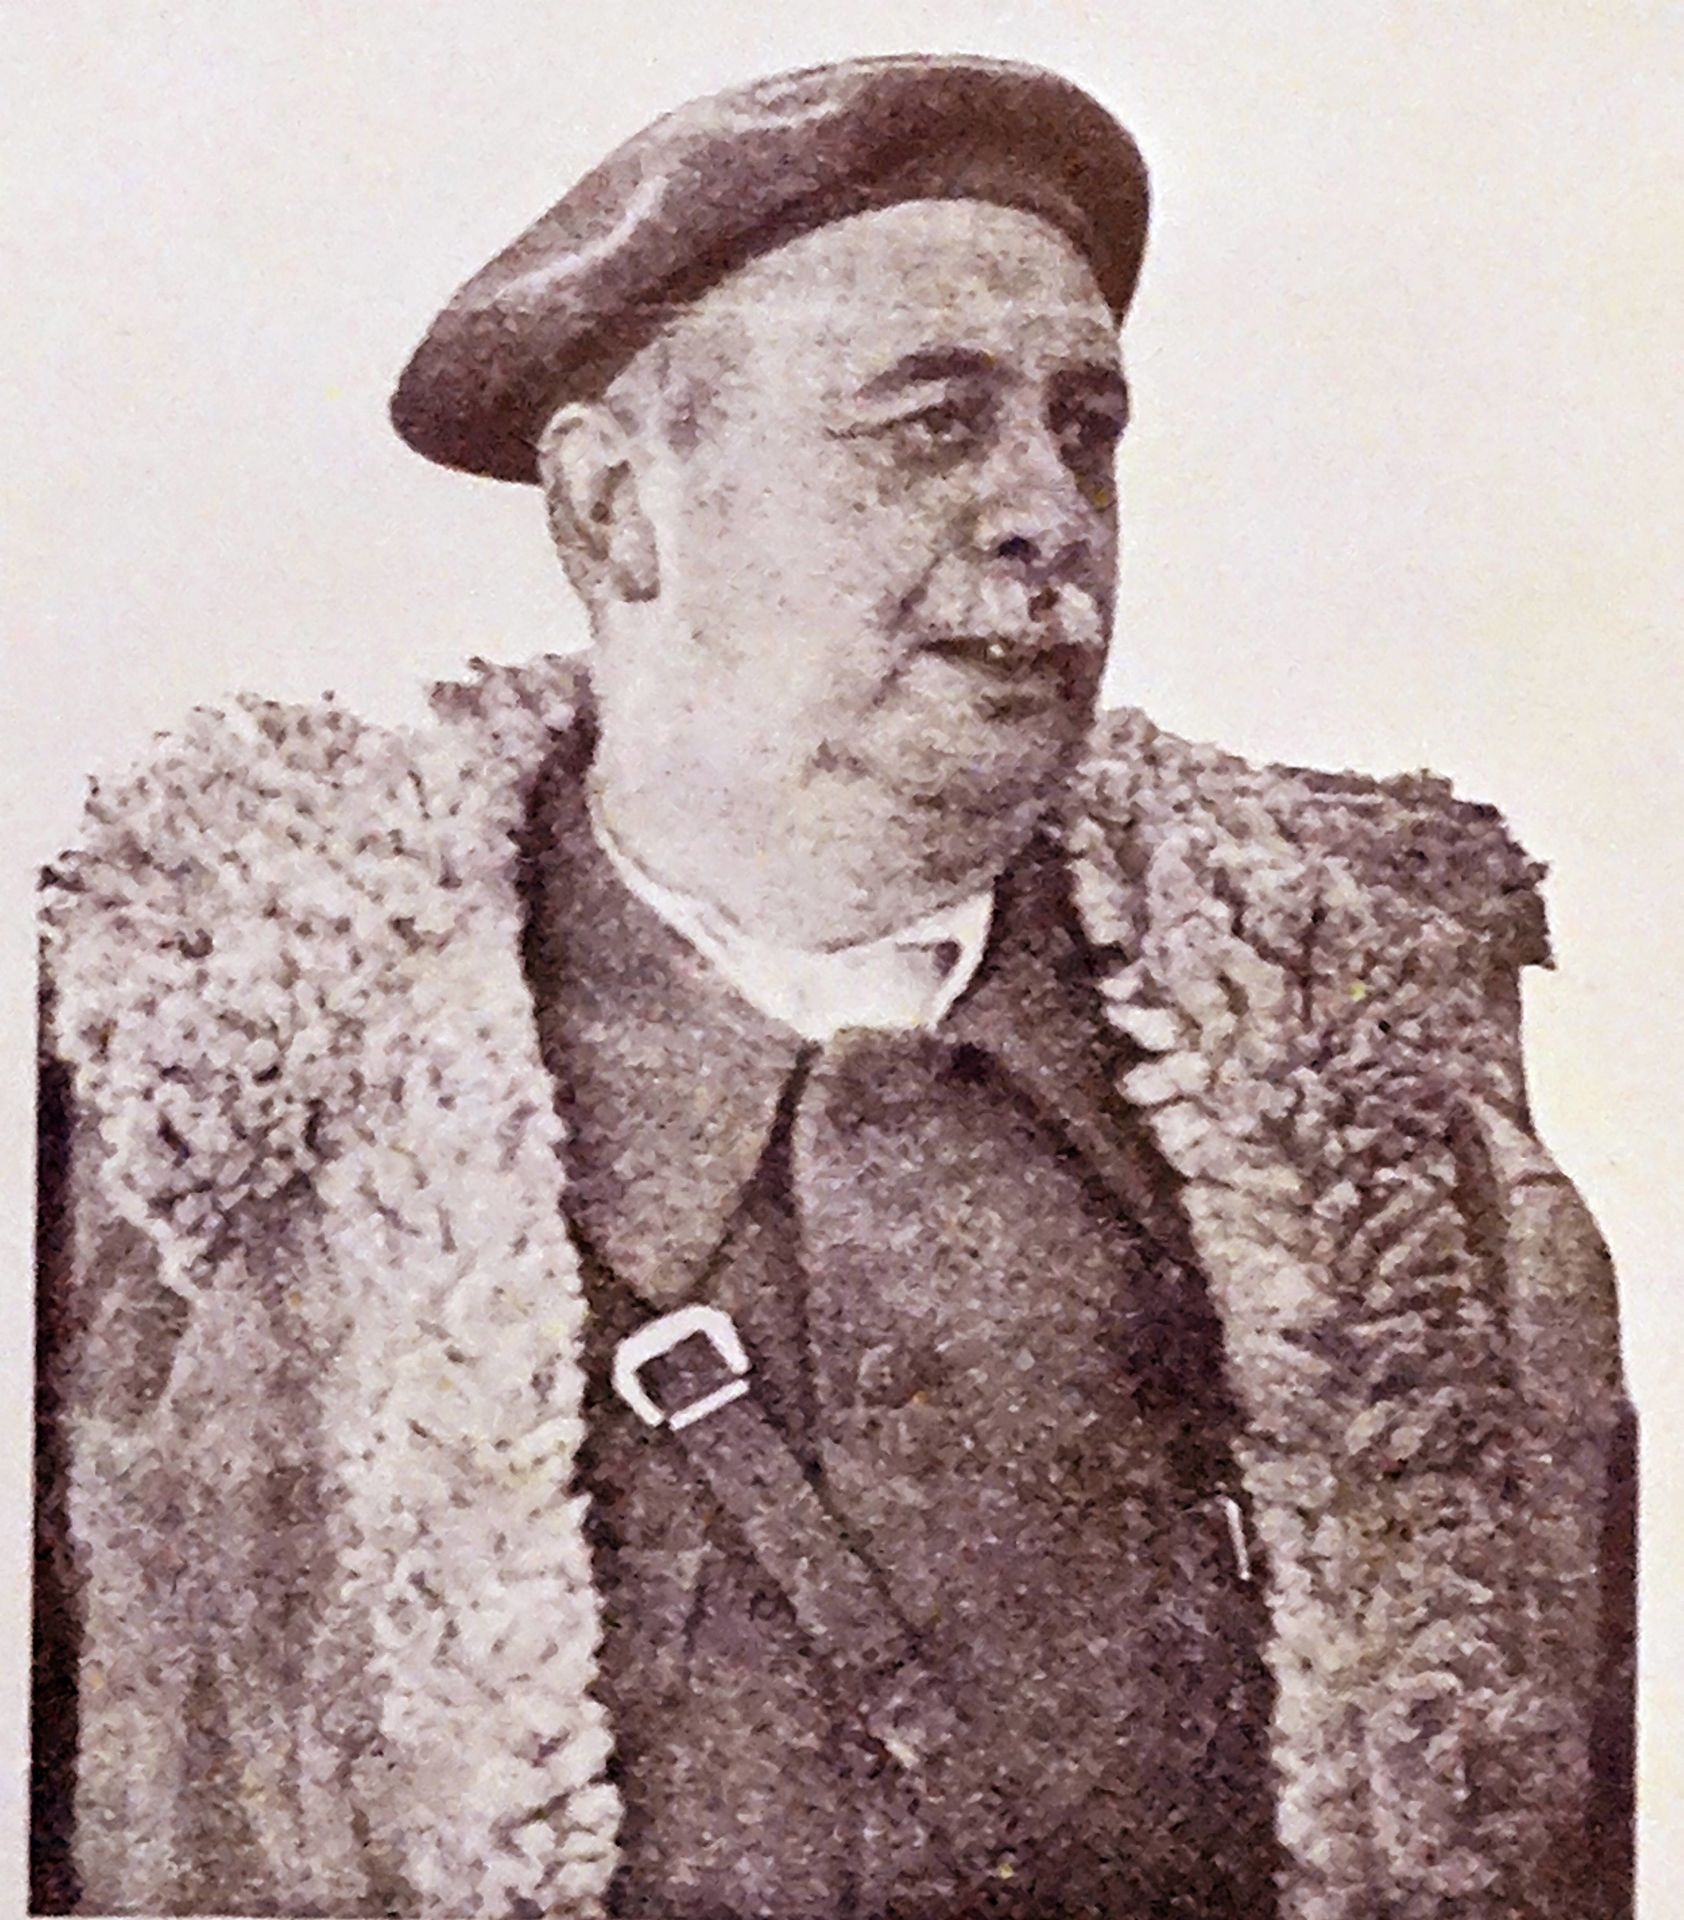 andre-marty-1886-1956.jpg